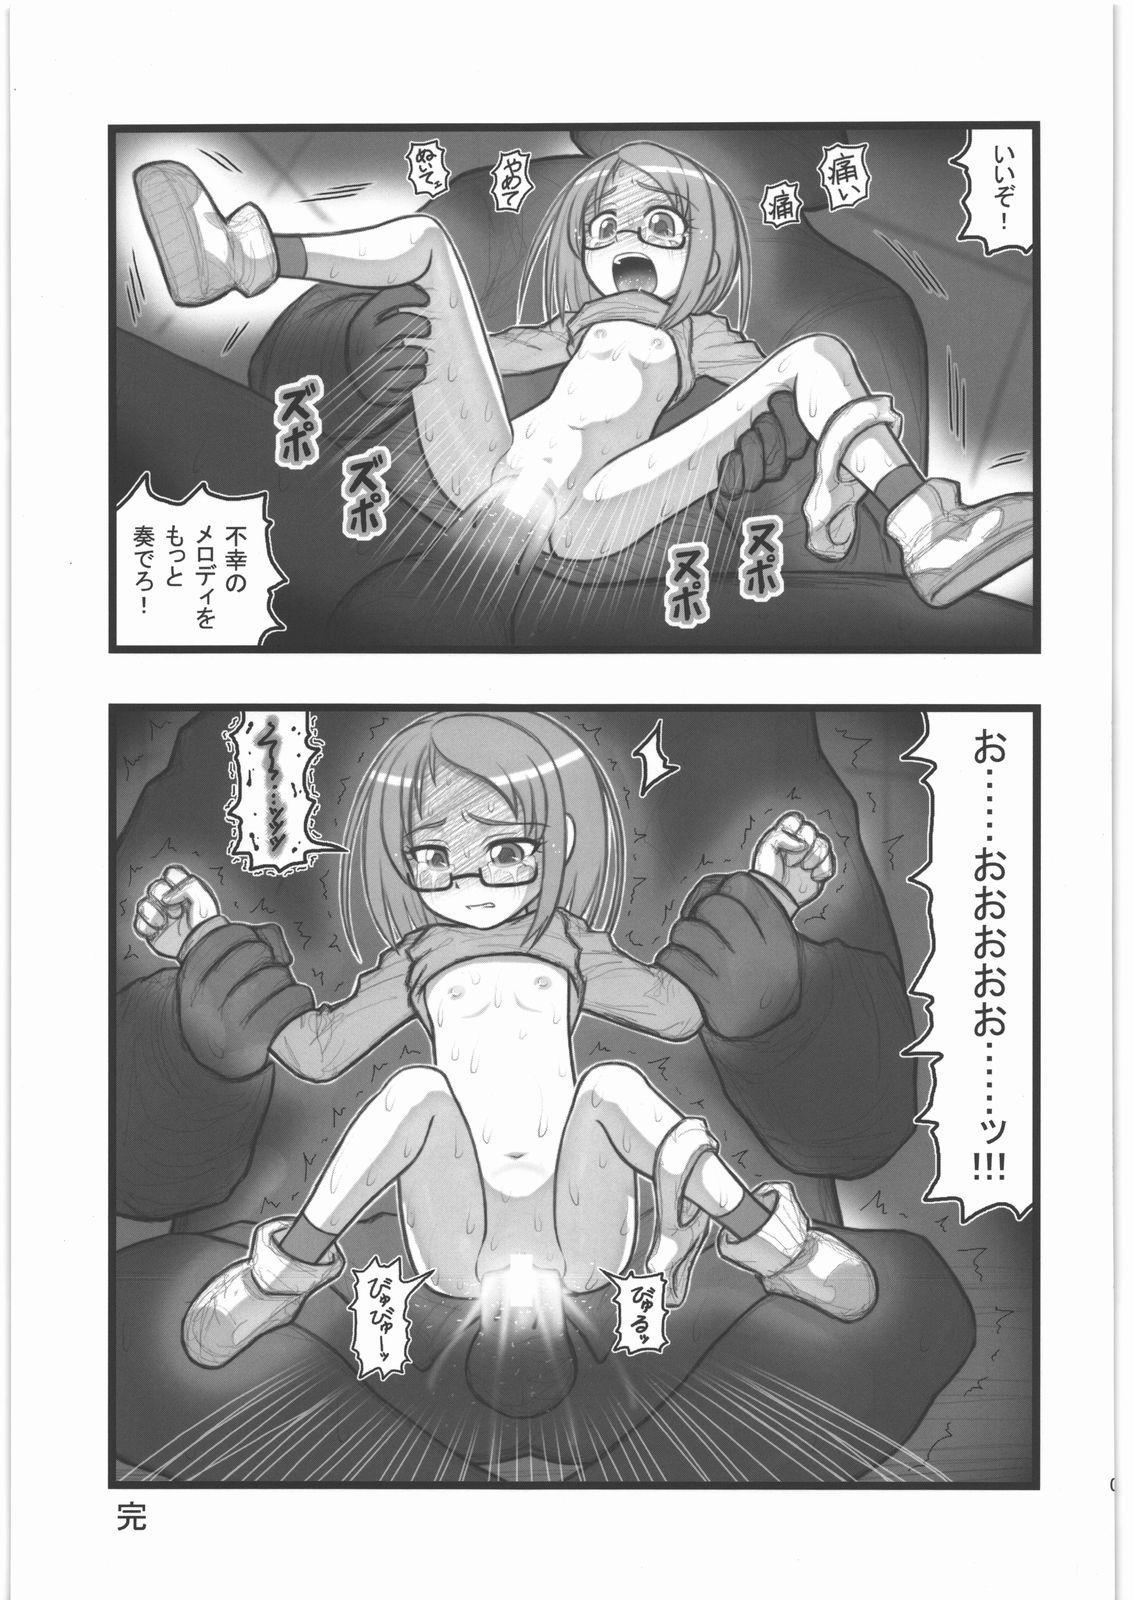 Ryoujoku Chara Box AR 3